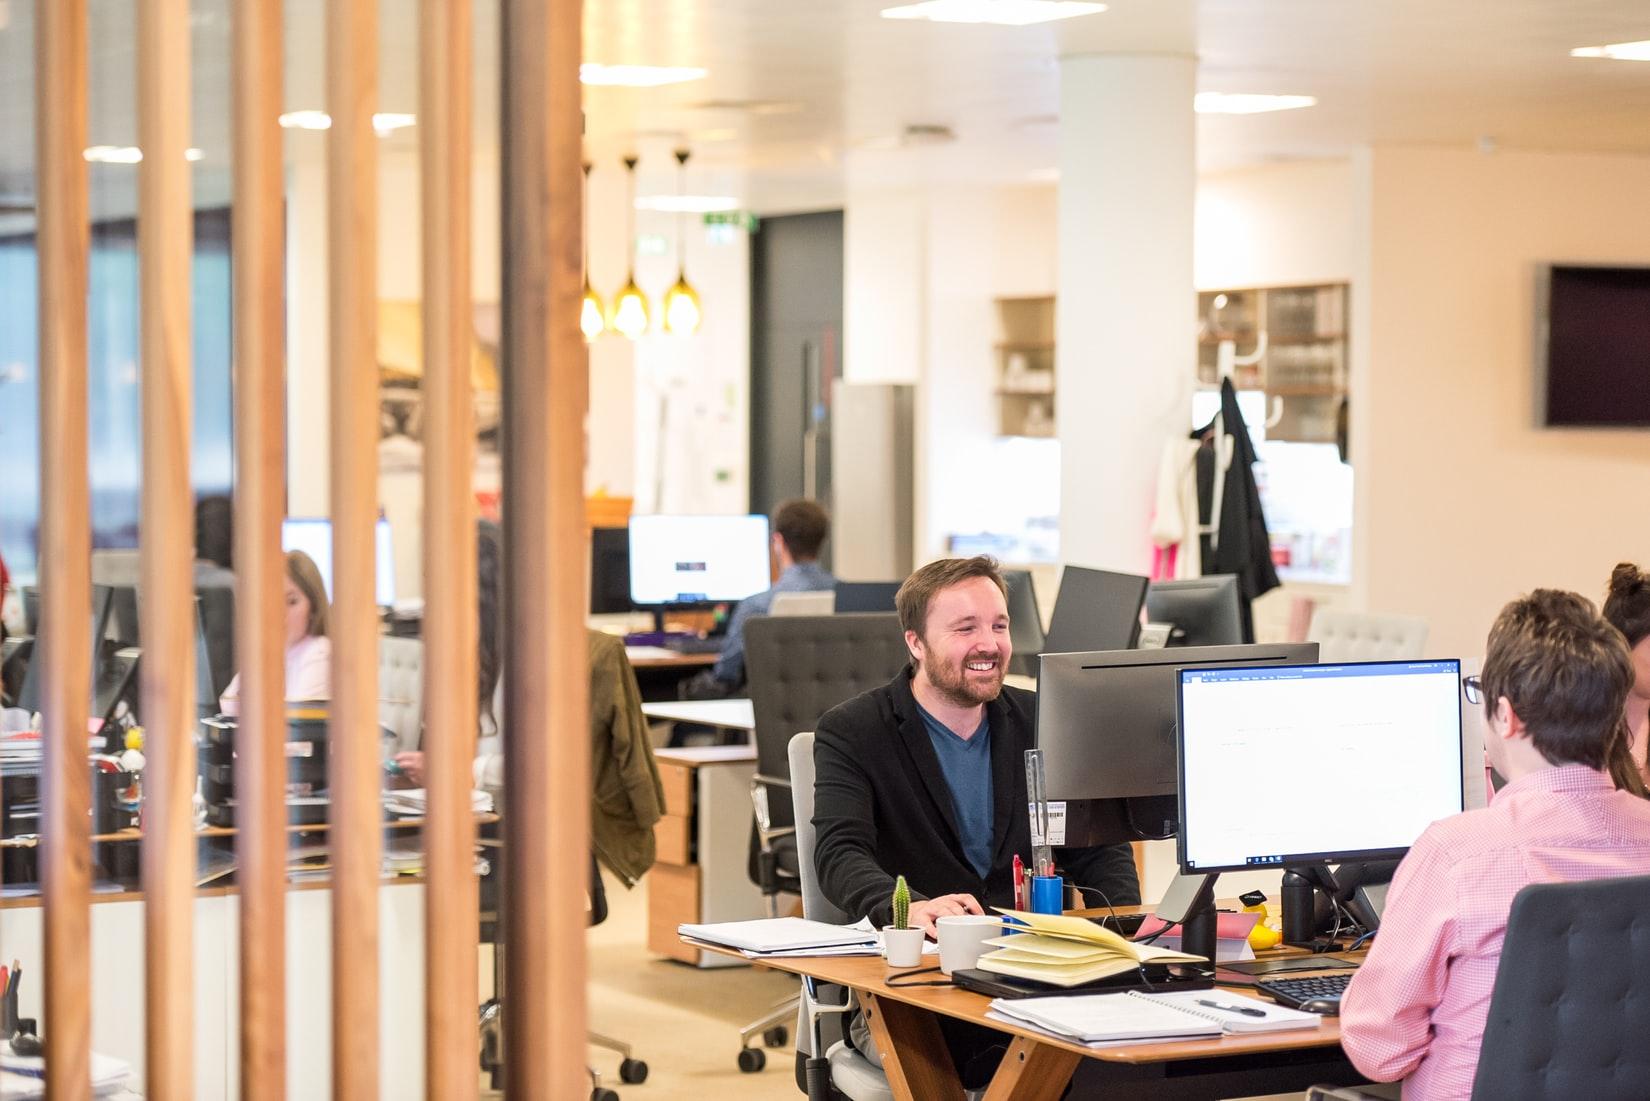 Better workplace communication using Enterprise Social Networking